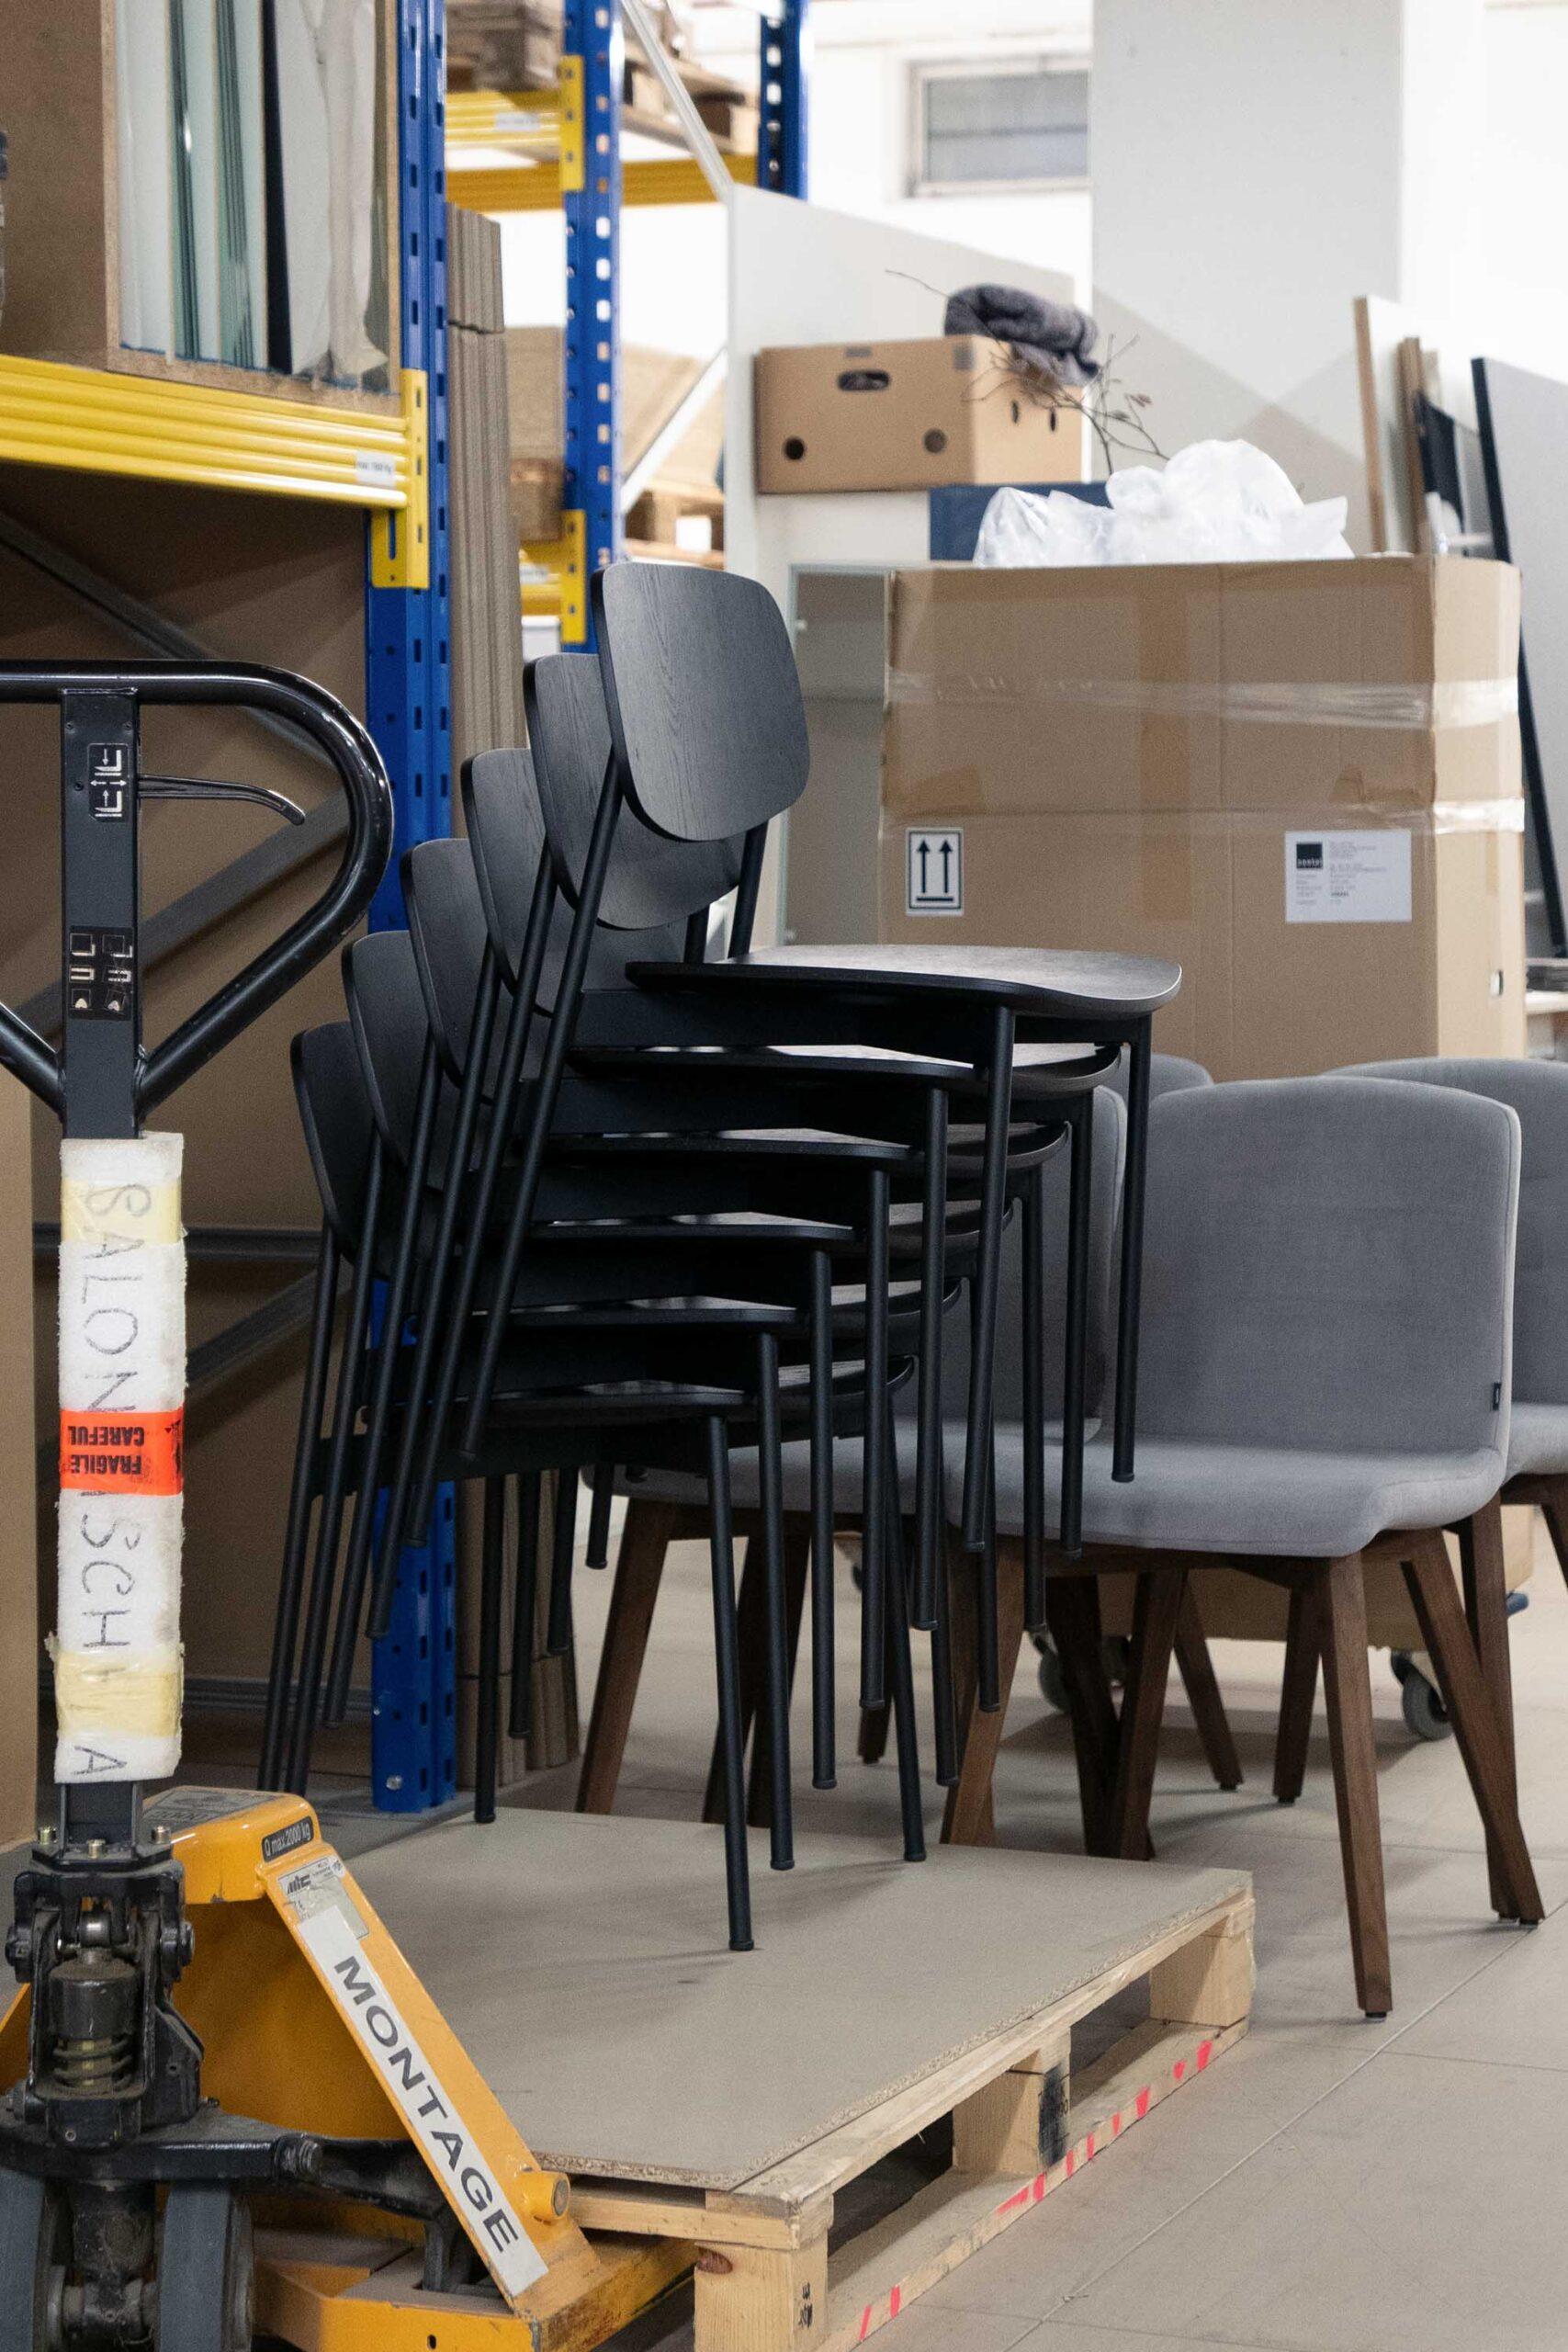 Andreas Bhend Industrial Design Studio inflagranti – 005